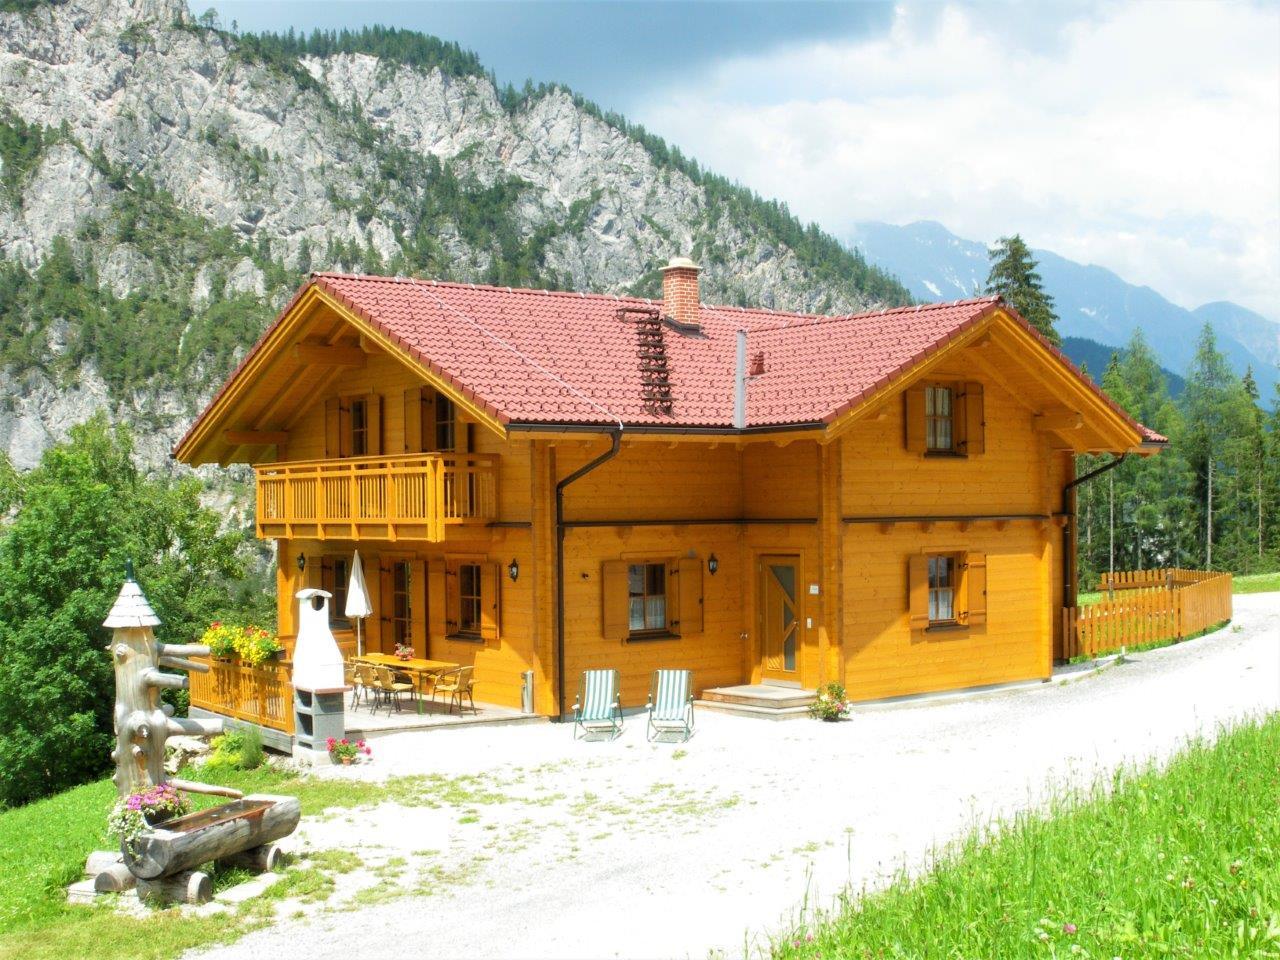 Maison de vacances Salzburg Forstau (2749310), Forstau, Pongau, Salzbourg, Autriche, image 1